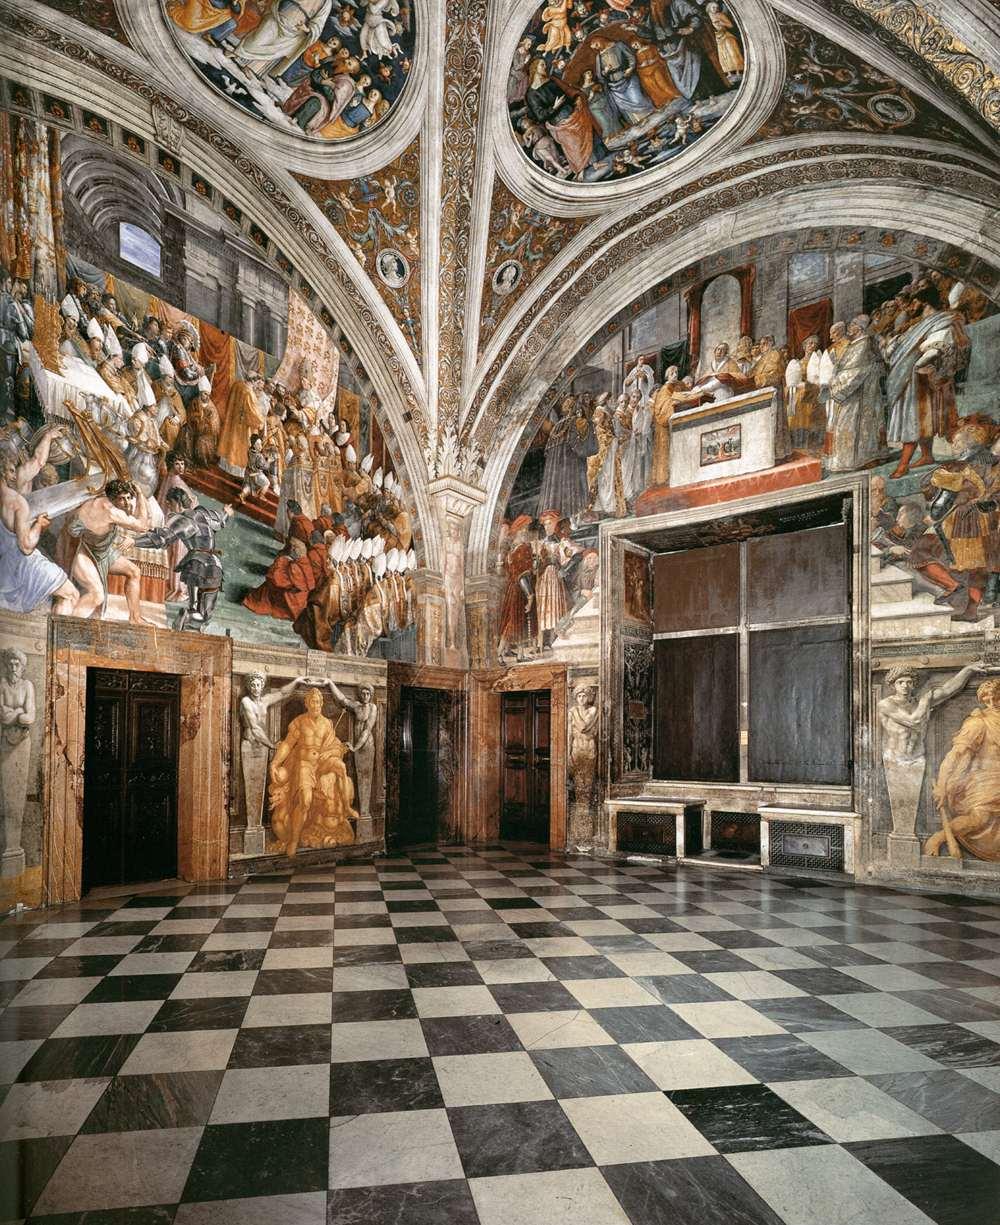 Chambre de Raphael aux musées du Vatican : Stanza dell'Incendio di Borgo - Photo d'0ro1